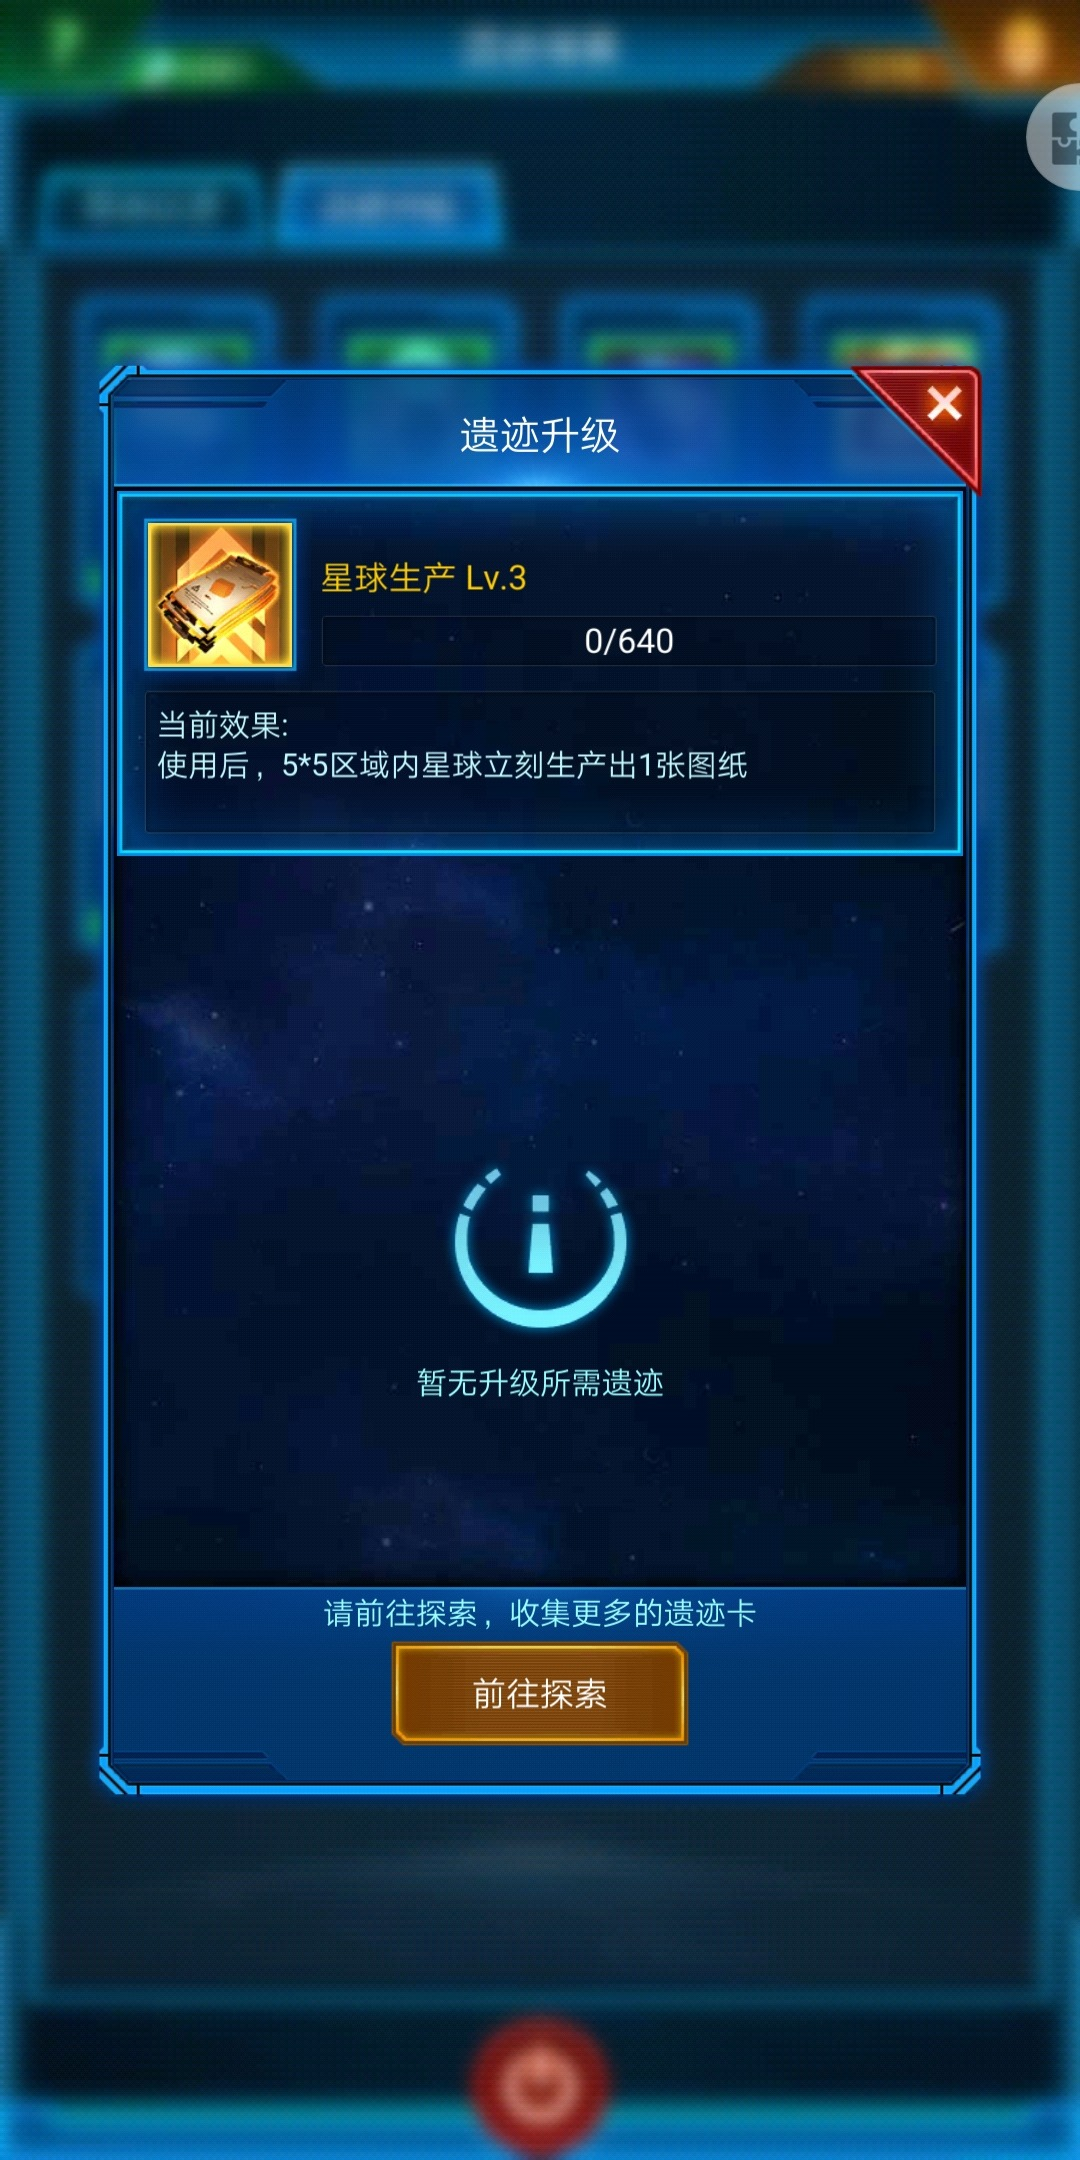 Screenshot_20190820_013152_com.jedigames.p16s.huawei.jpg